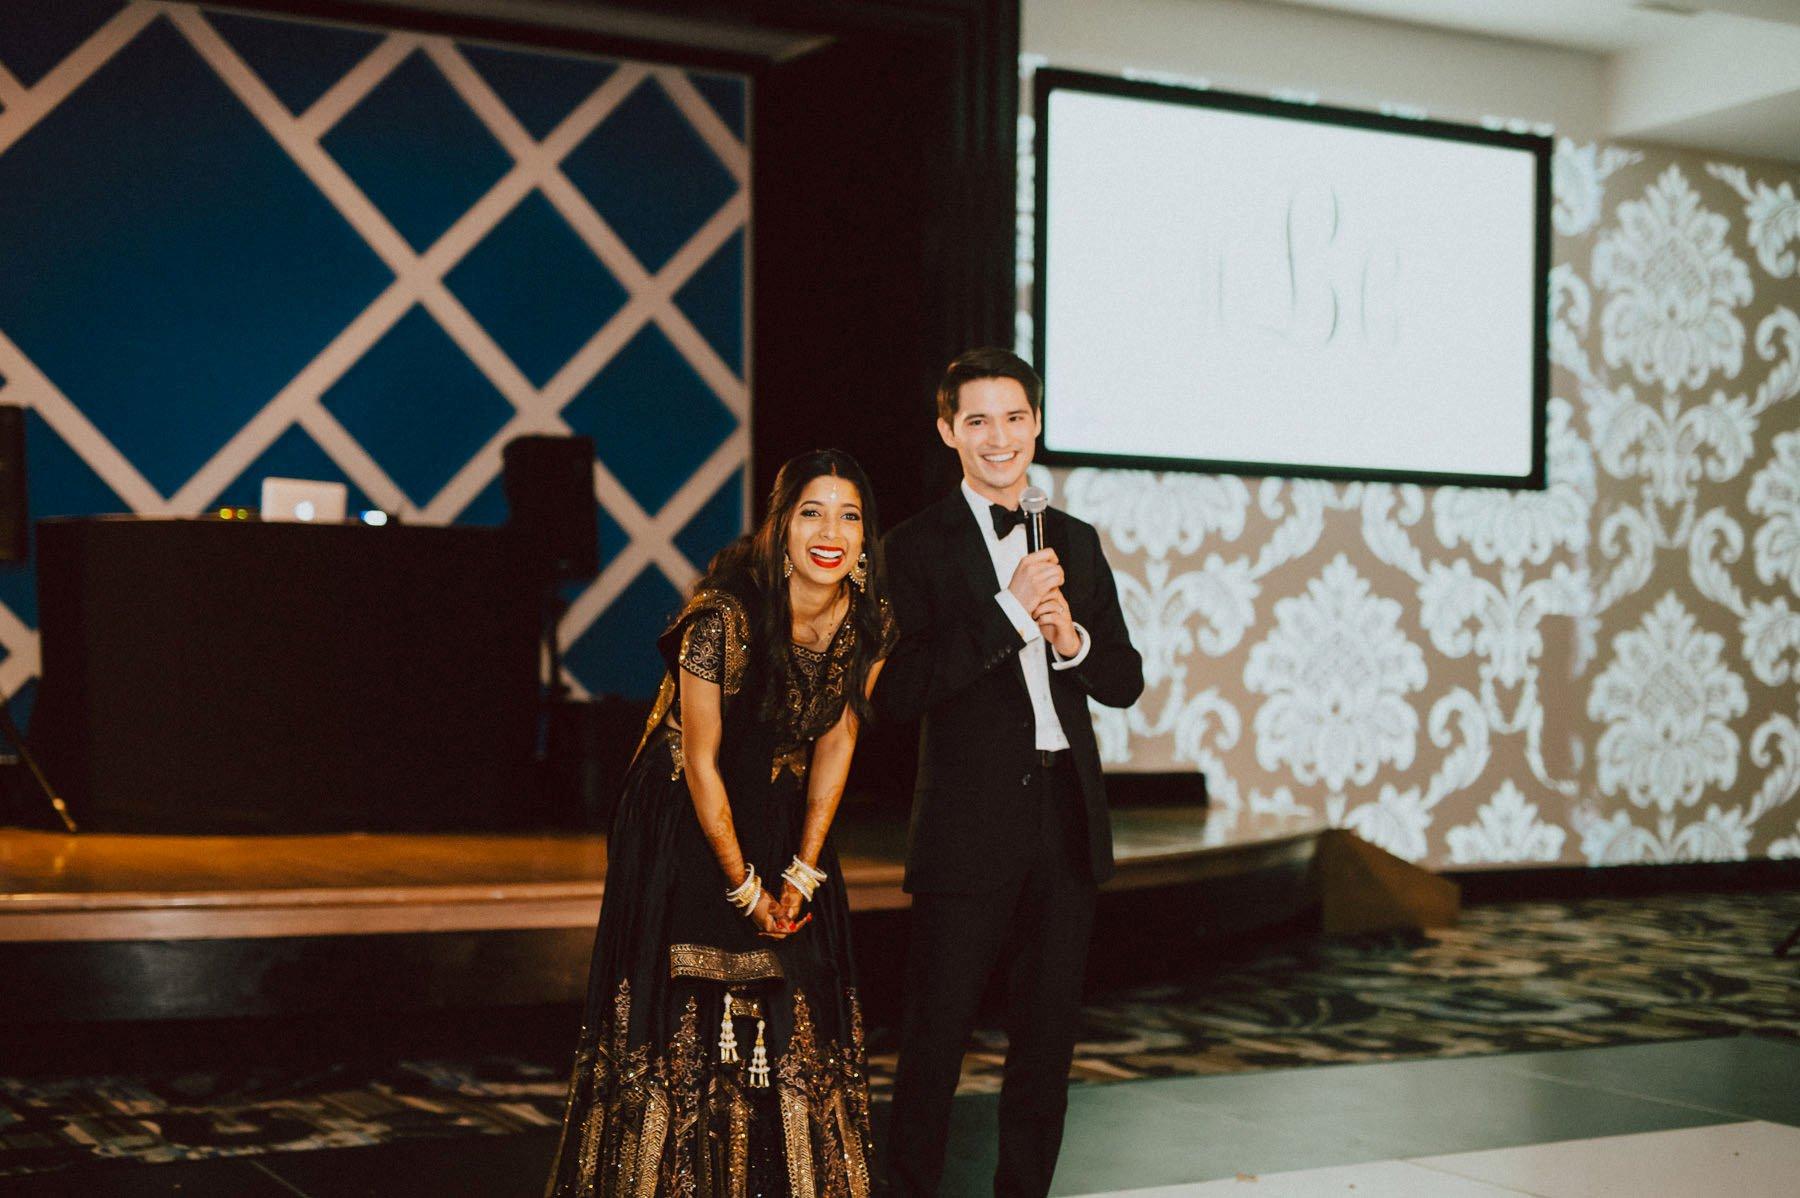 vie-philadelphia-indian-wedding-115.jpg